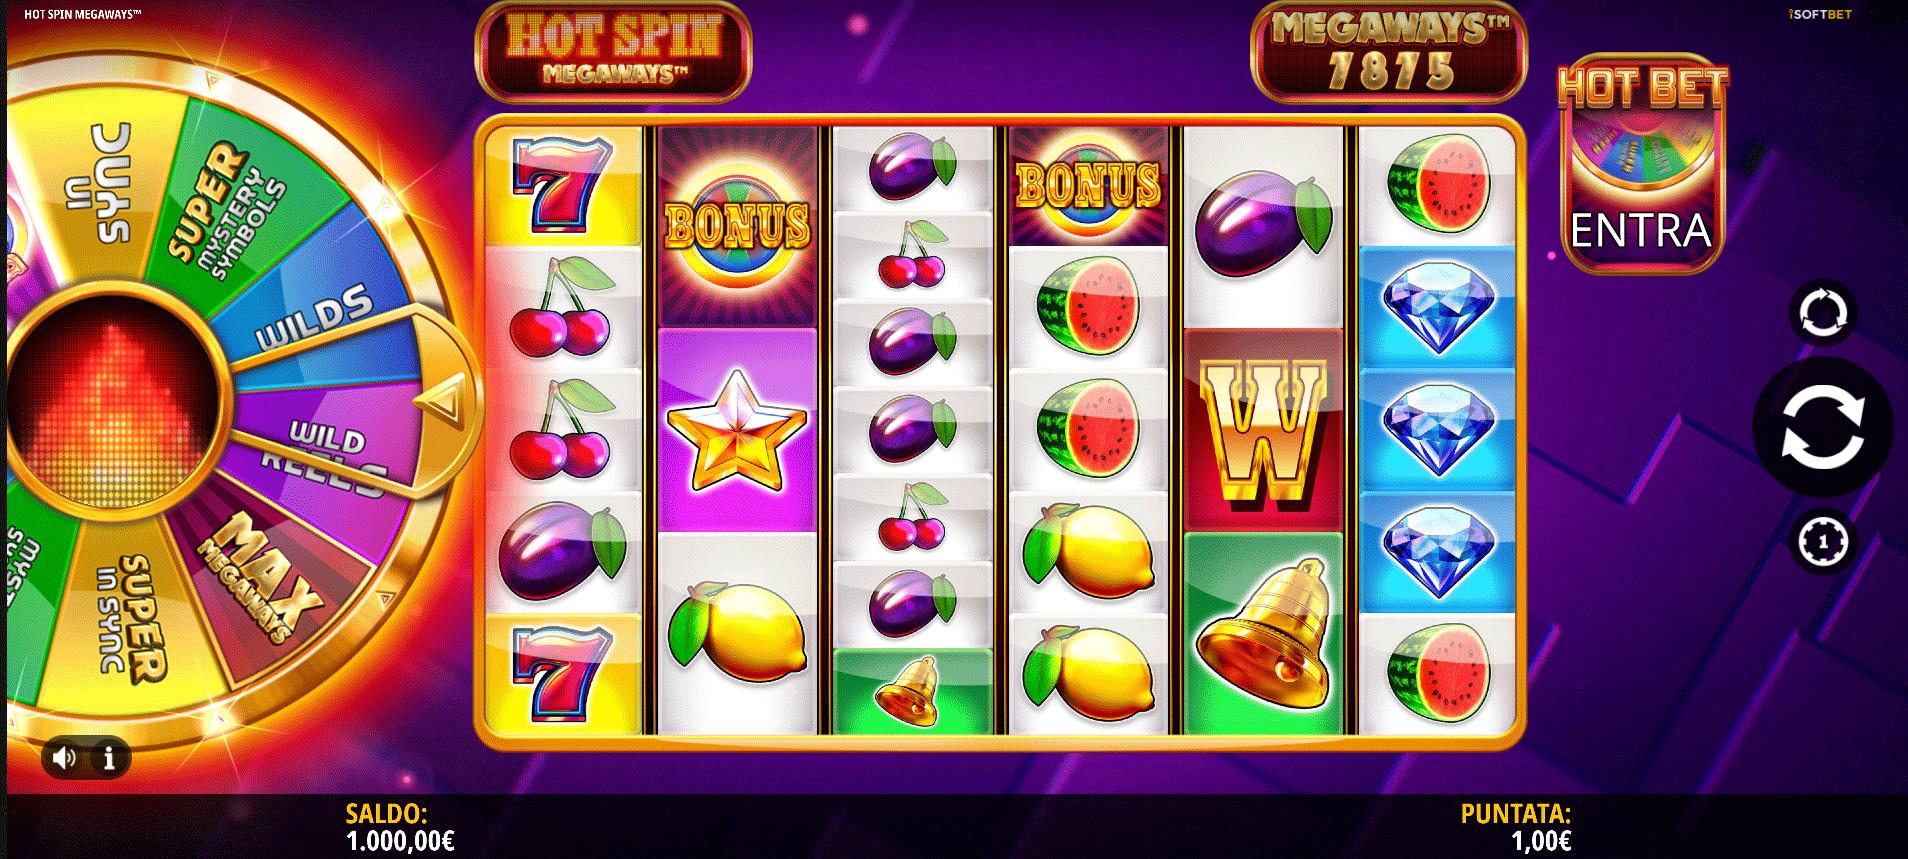 Slot Hot Spin Megaways